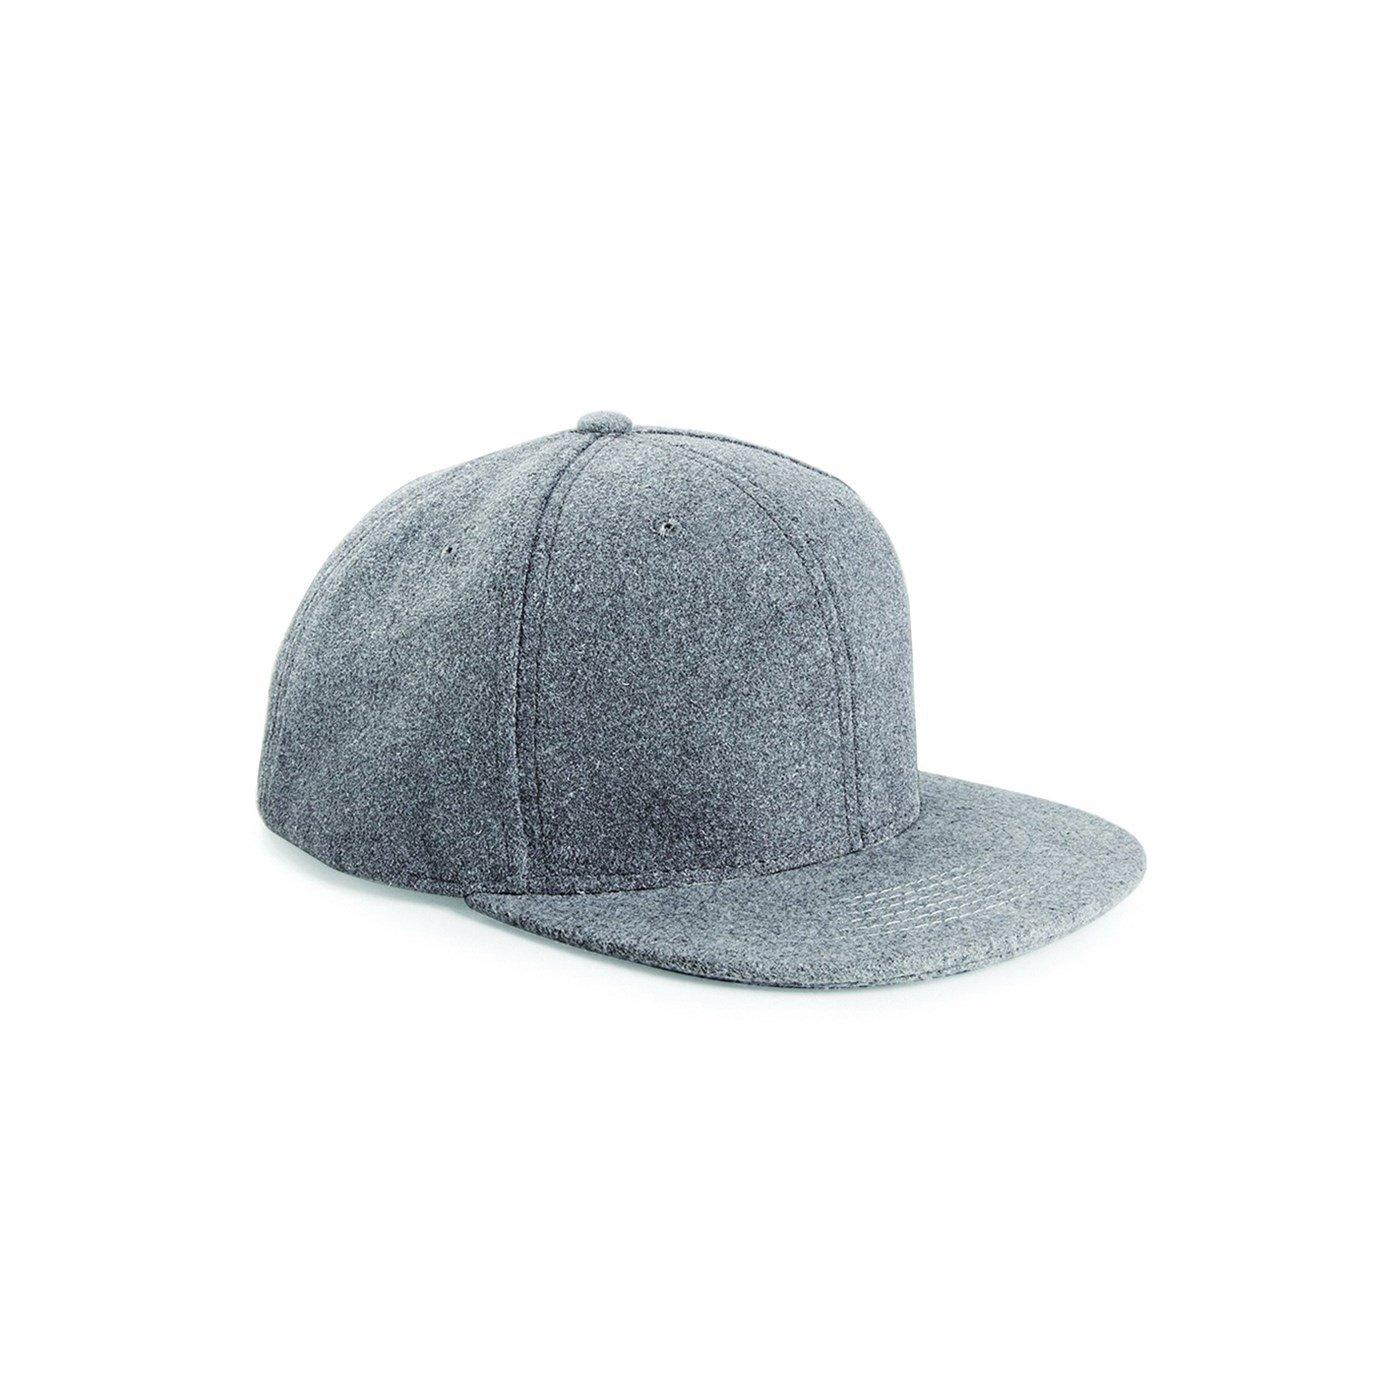 98f6e822f2c Beechfield Adult s Flat Peak Melton Wool Snapback Cap BC675